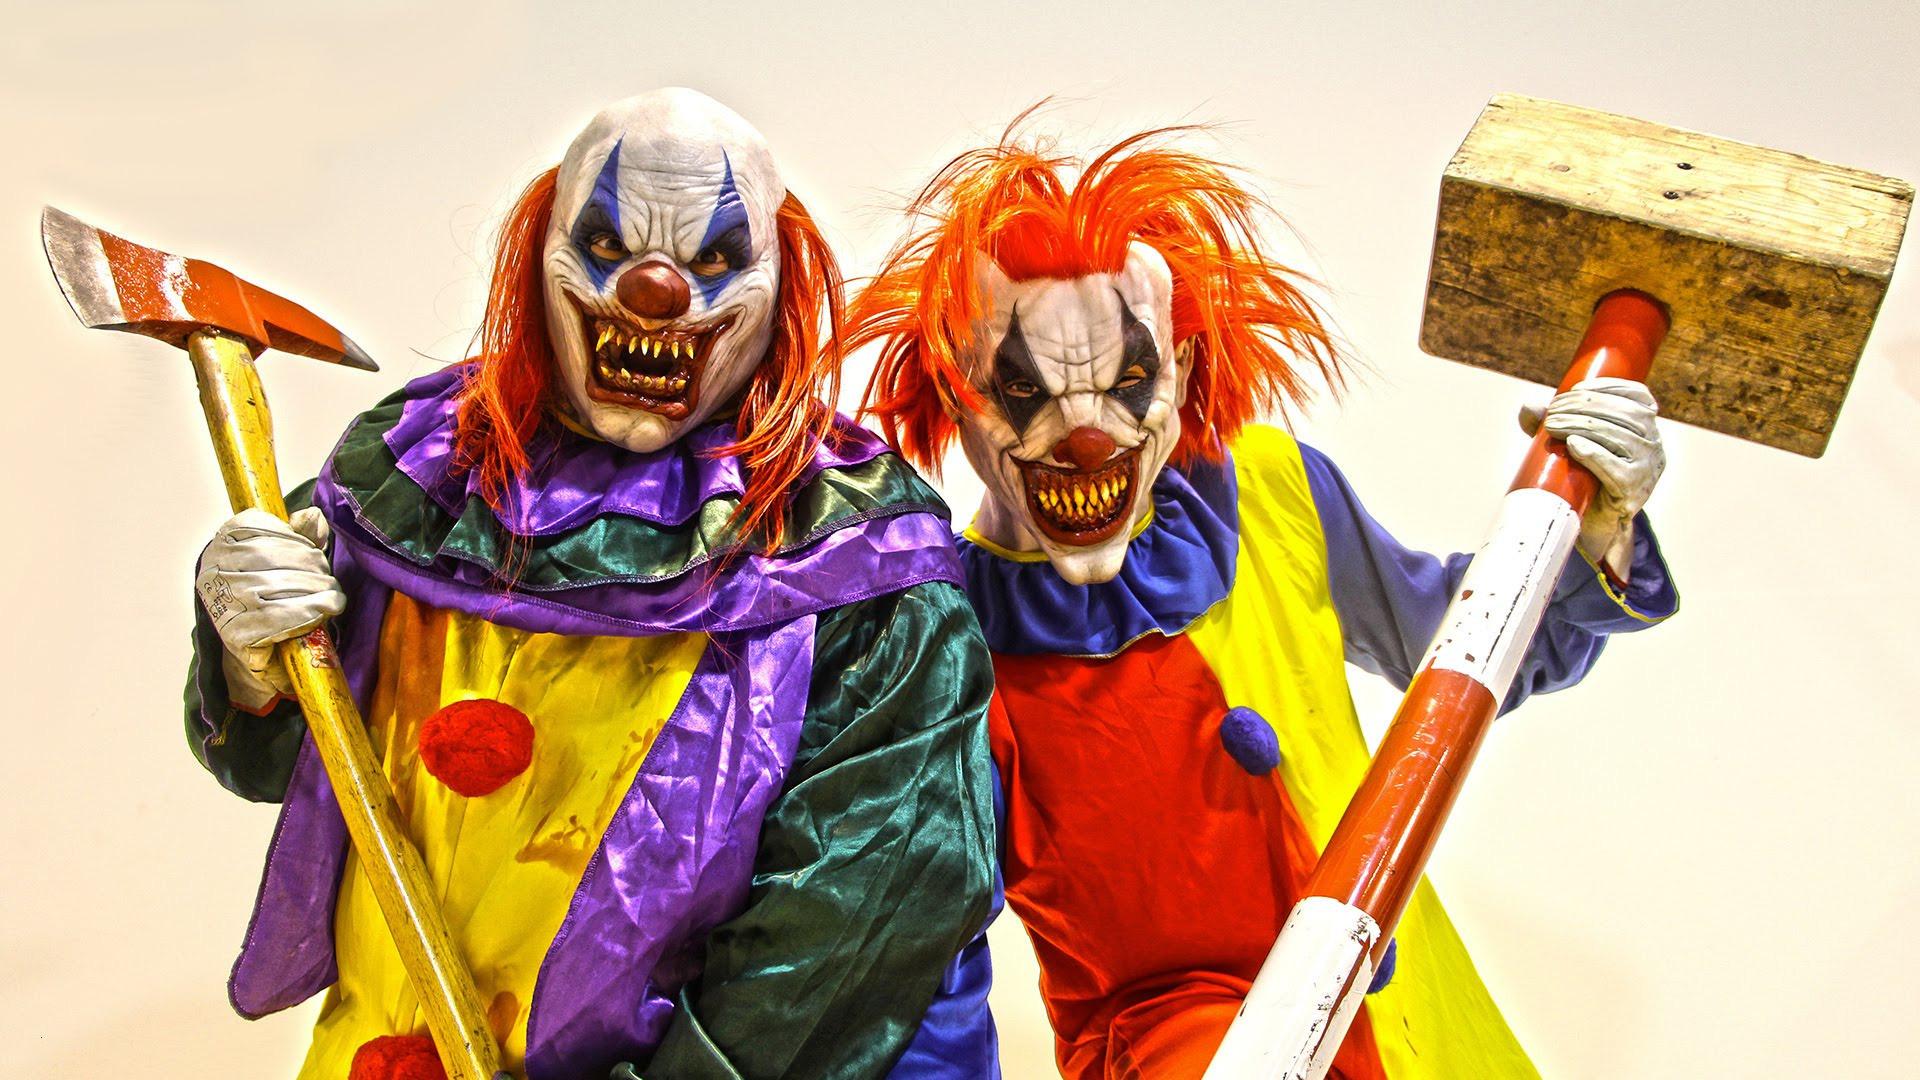 Clown Zum Ausmalen Genial Killer Clown 7 Resurrection Scare Prank Genial Ausmalbilder Zirkus Das Bild